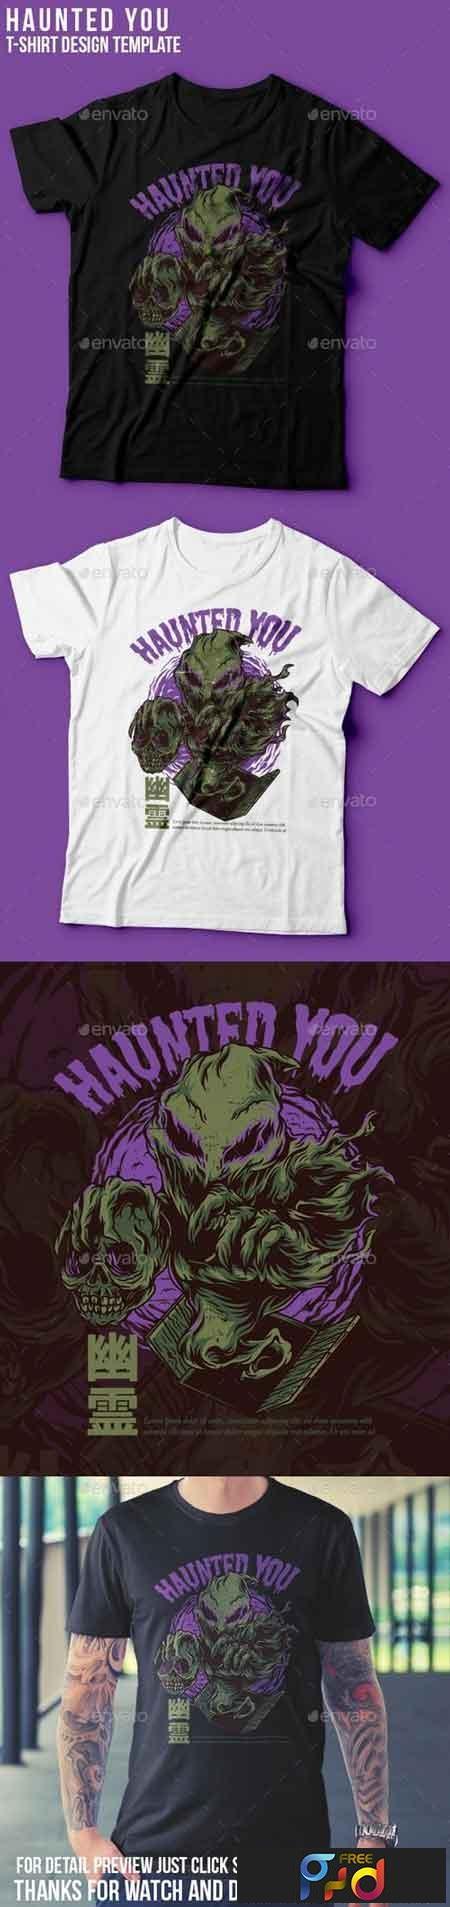 Haunted You T-Shirt Design 22765693 1